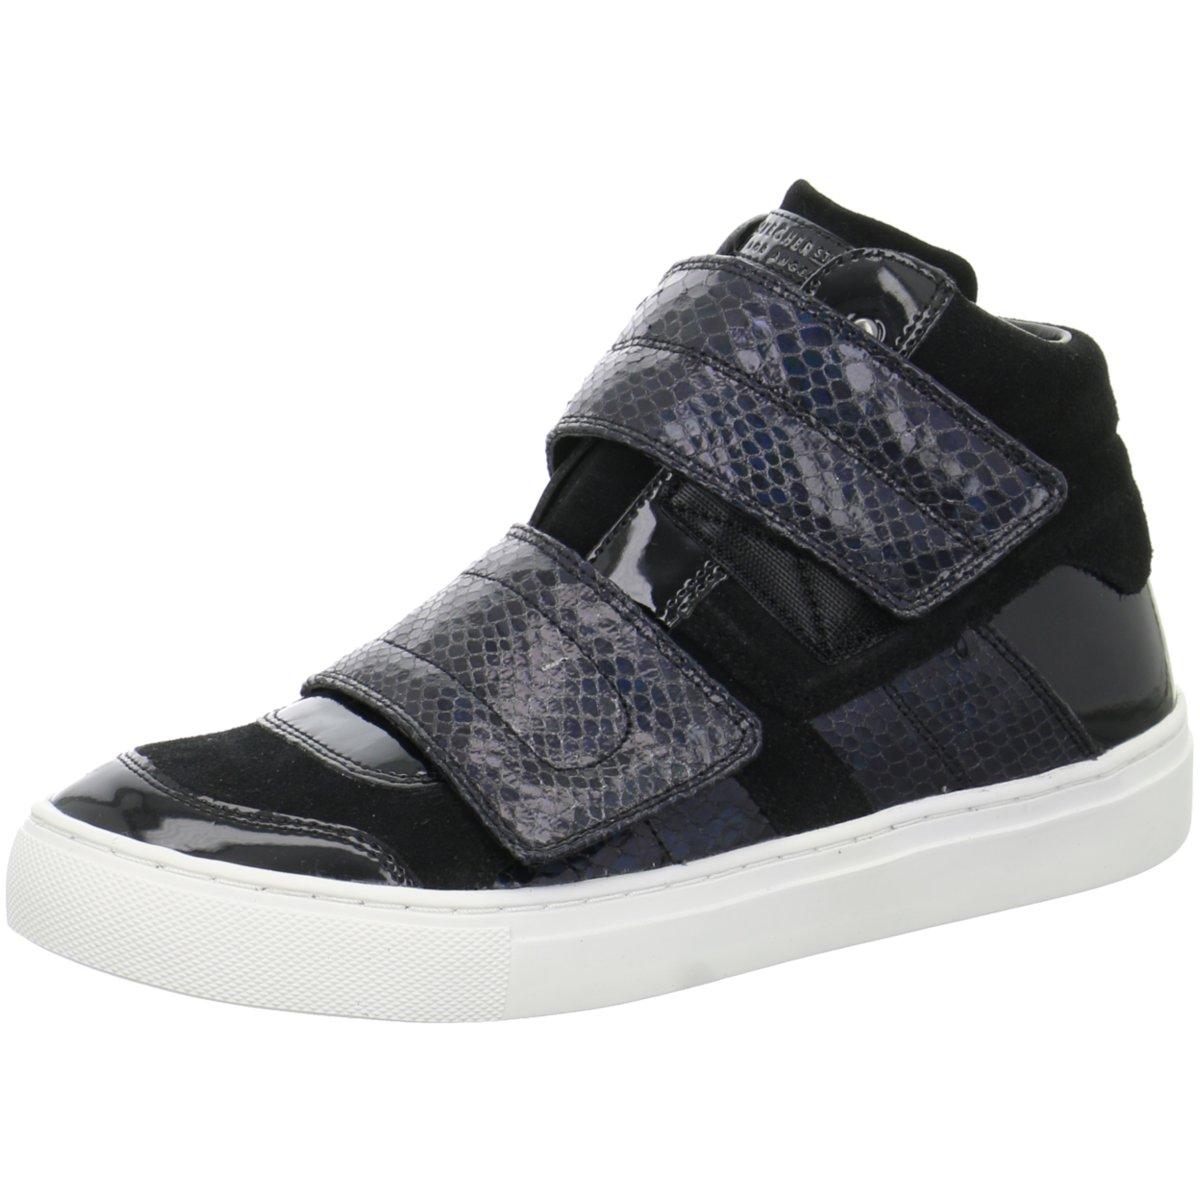 NEU Skechers Damen Sneaker 73575 BLK schwarz 345522